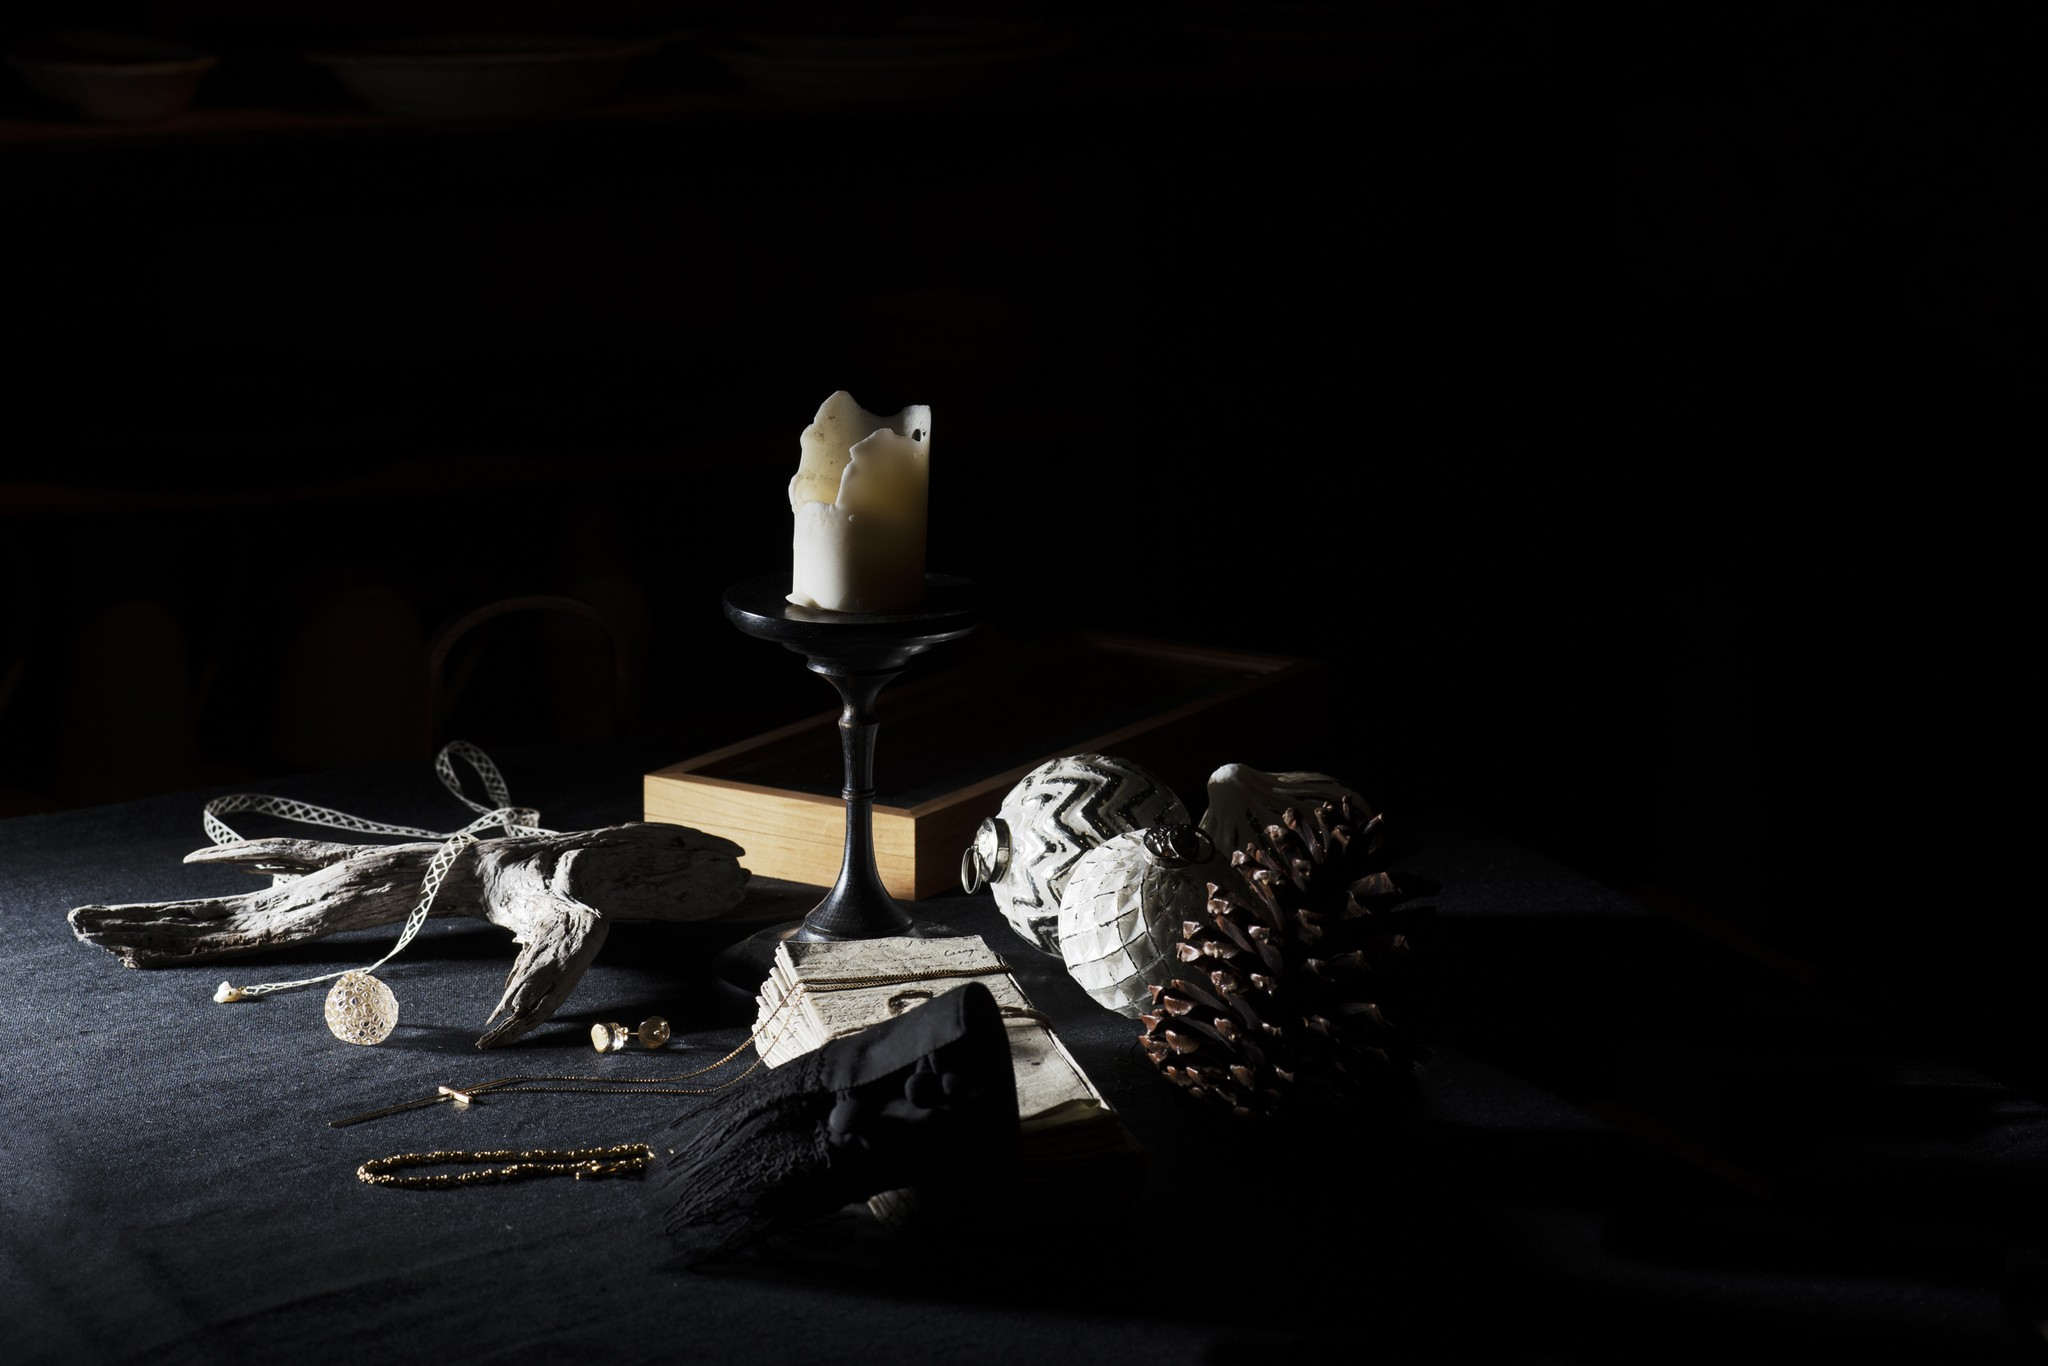 Accessories & Clothes exhibition